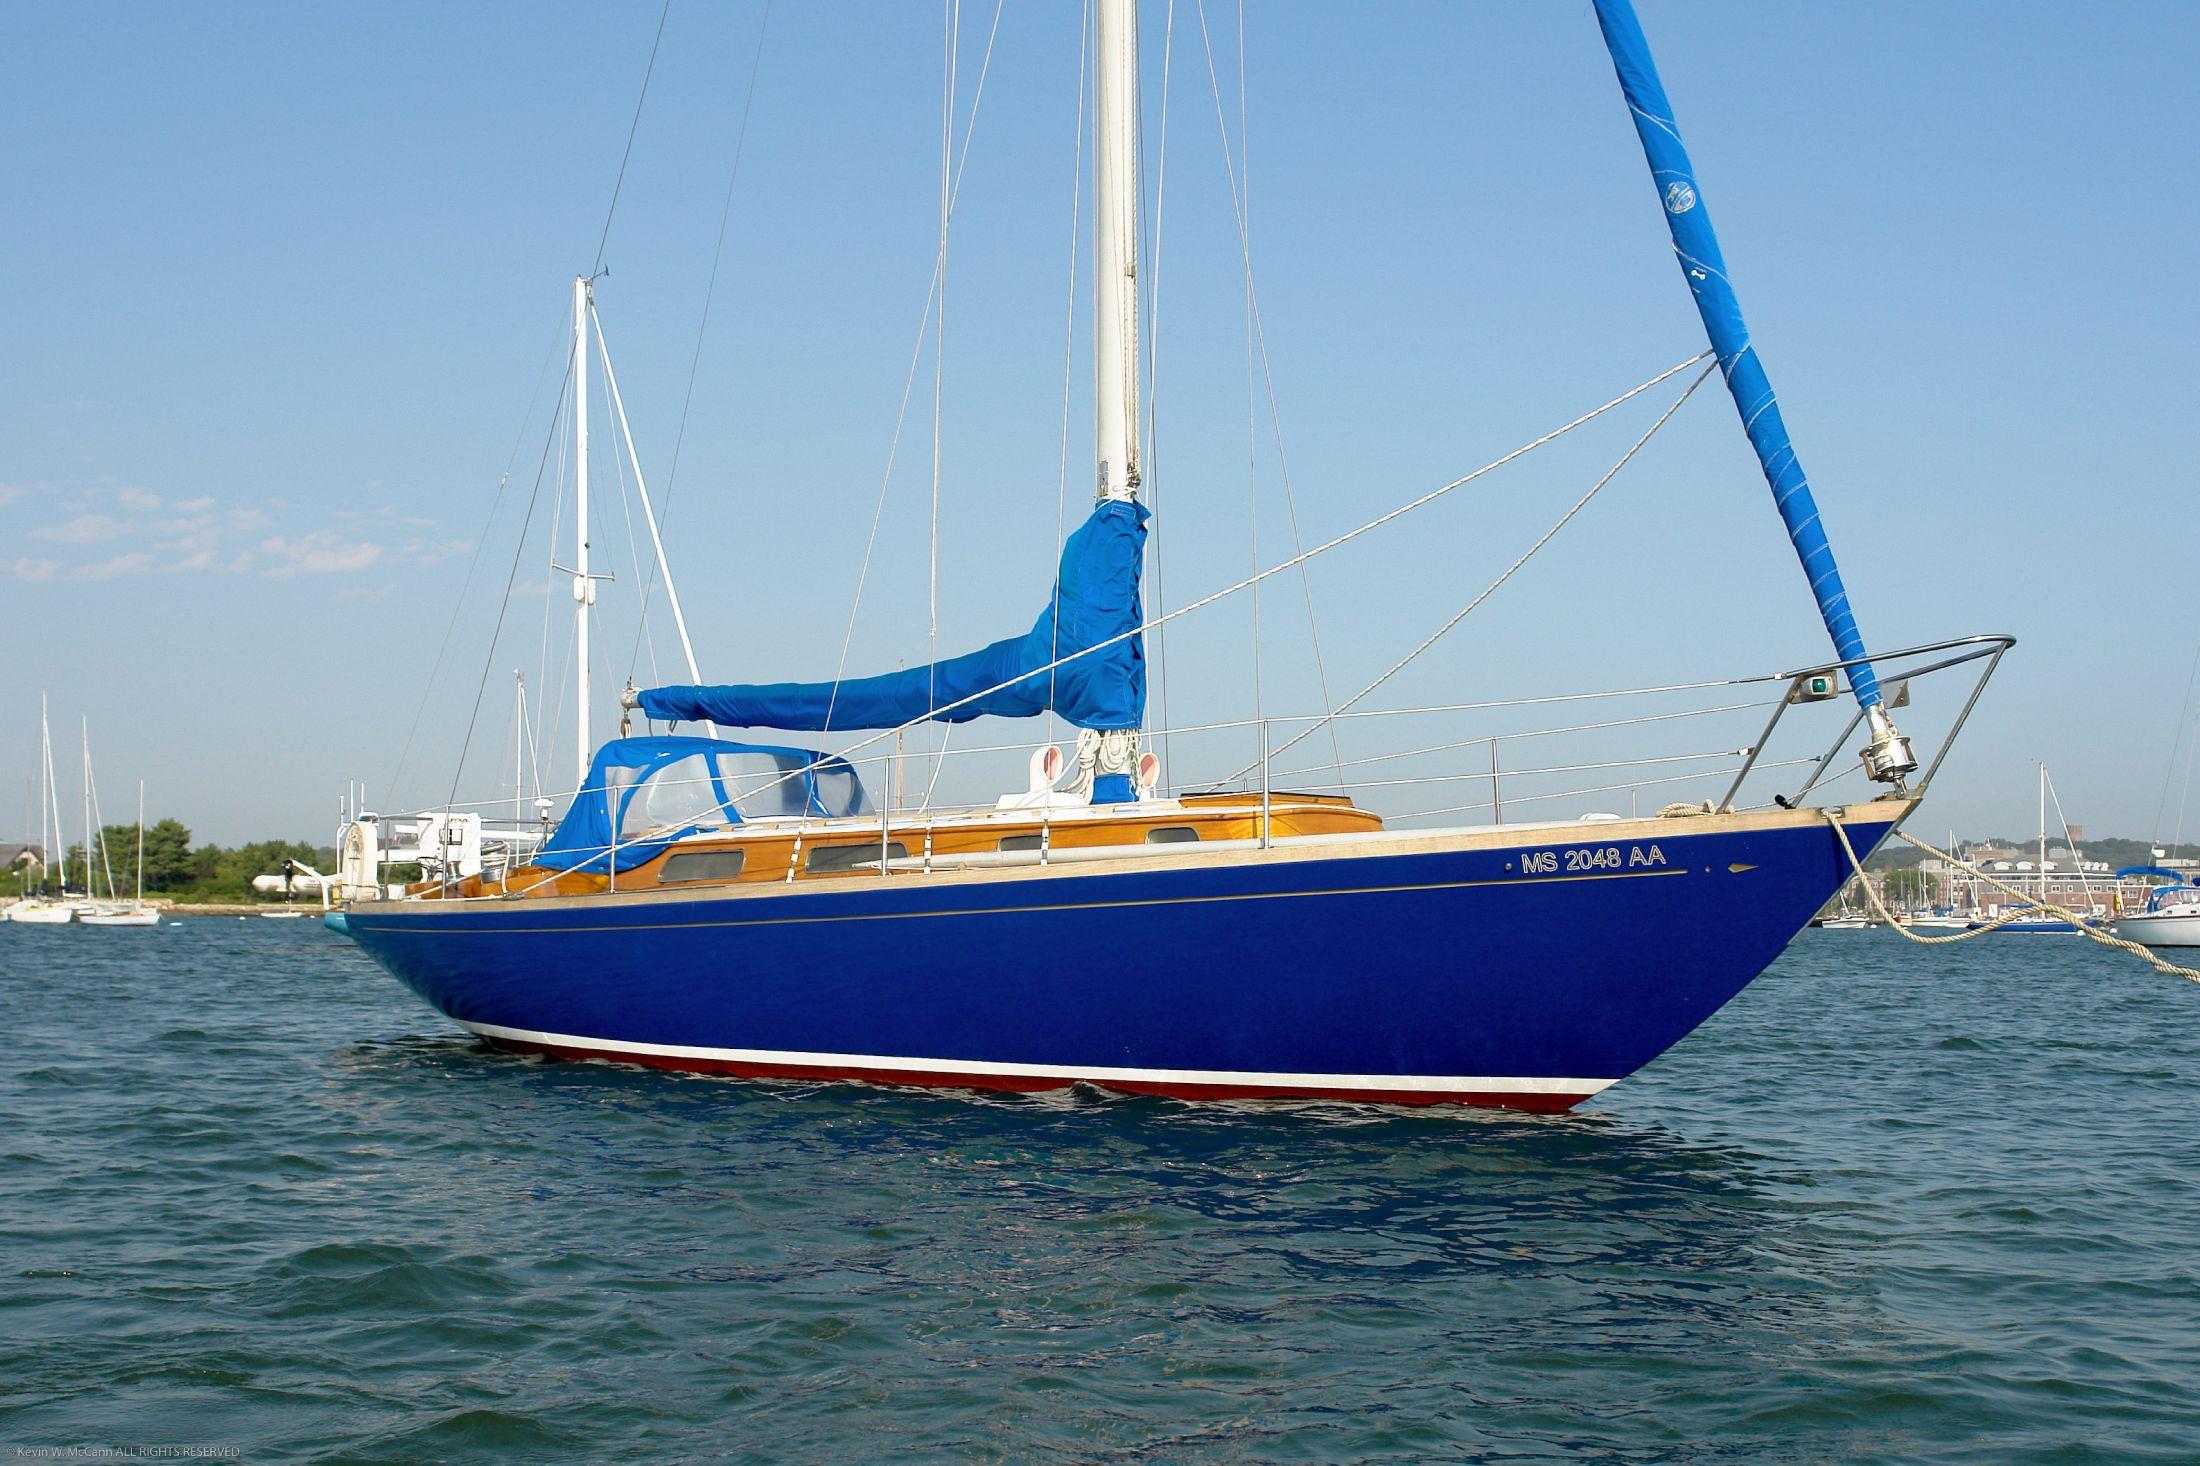 1969 Ohlson 38 Sail Boat For Sale Wwwyachtworldcom